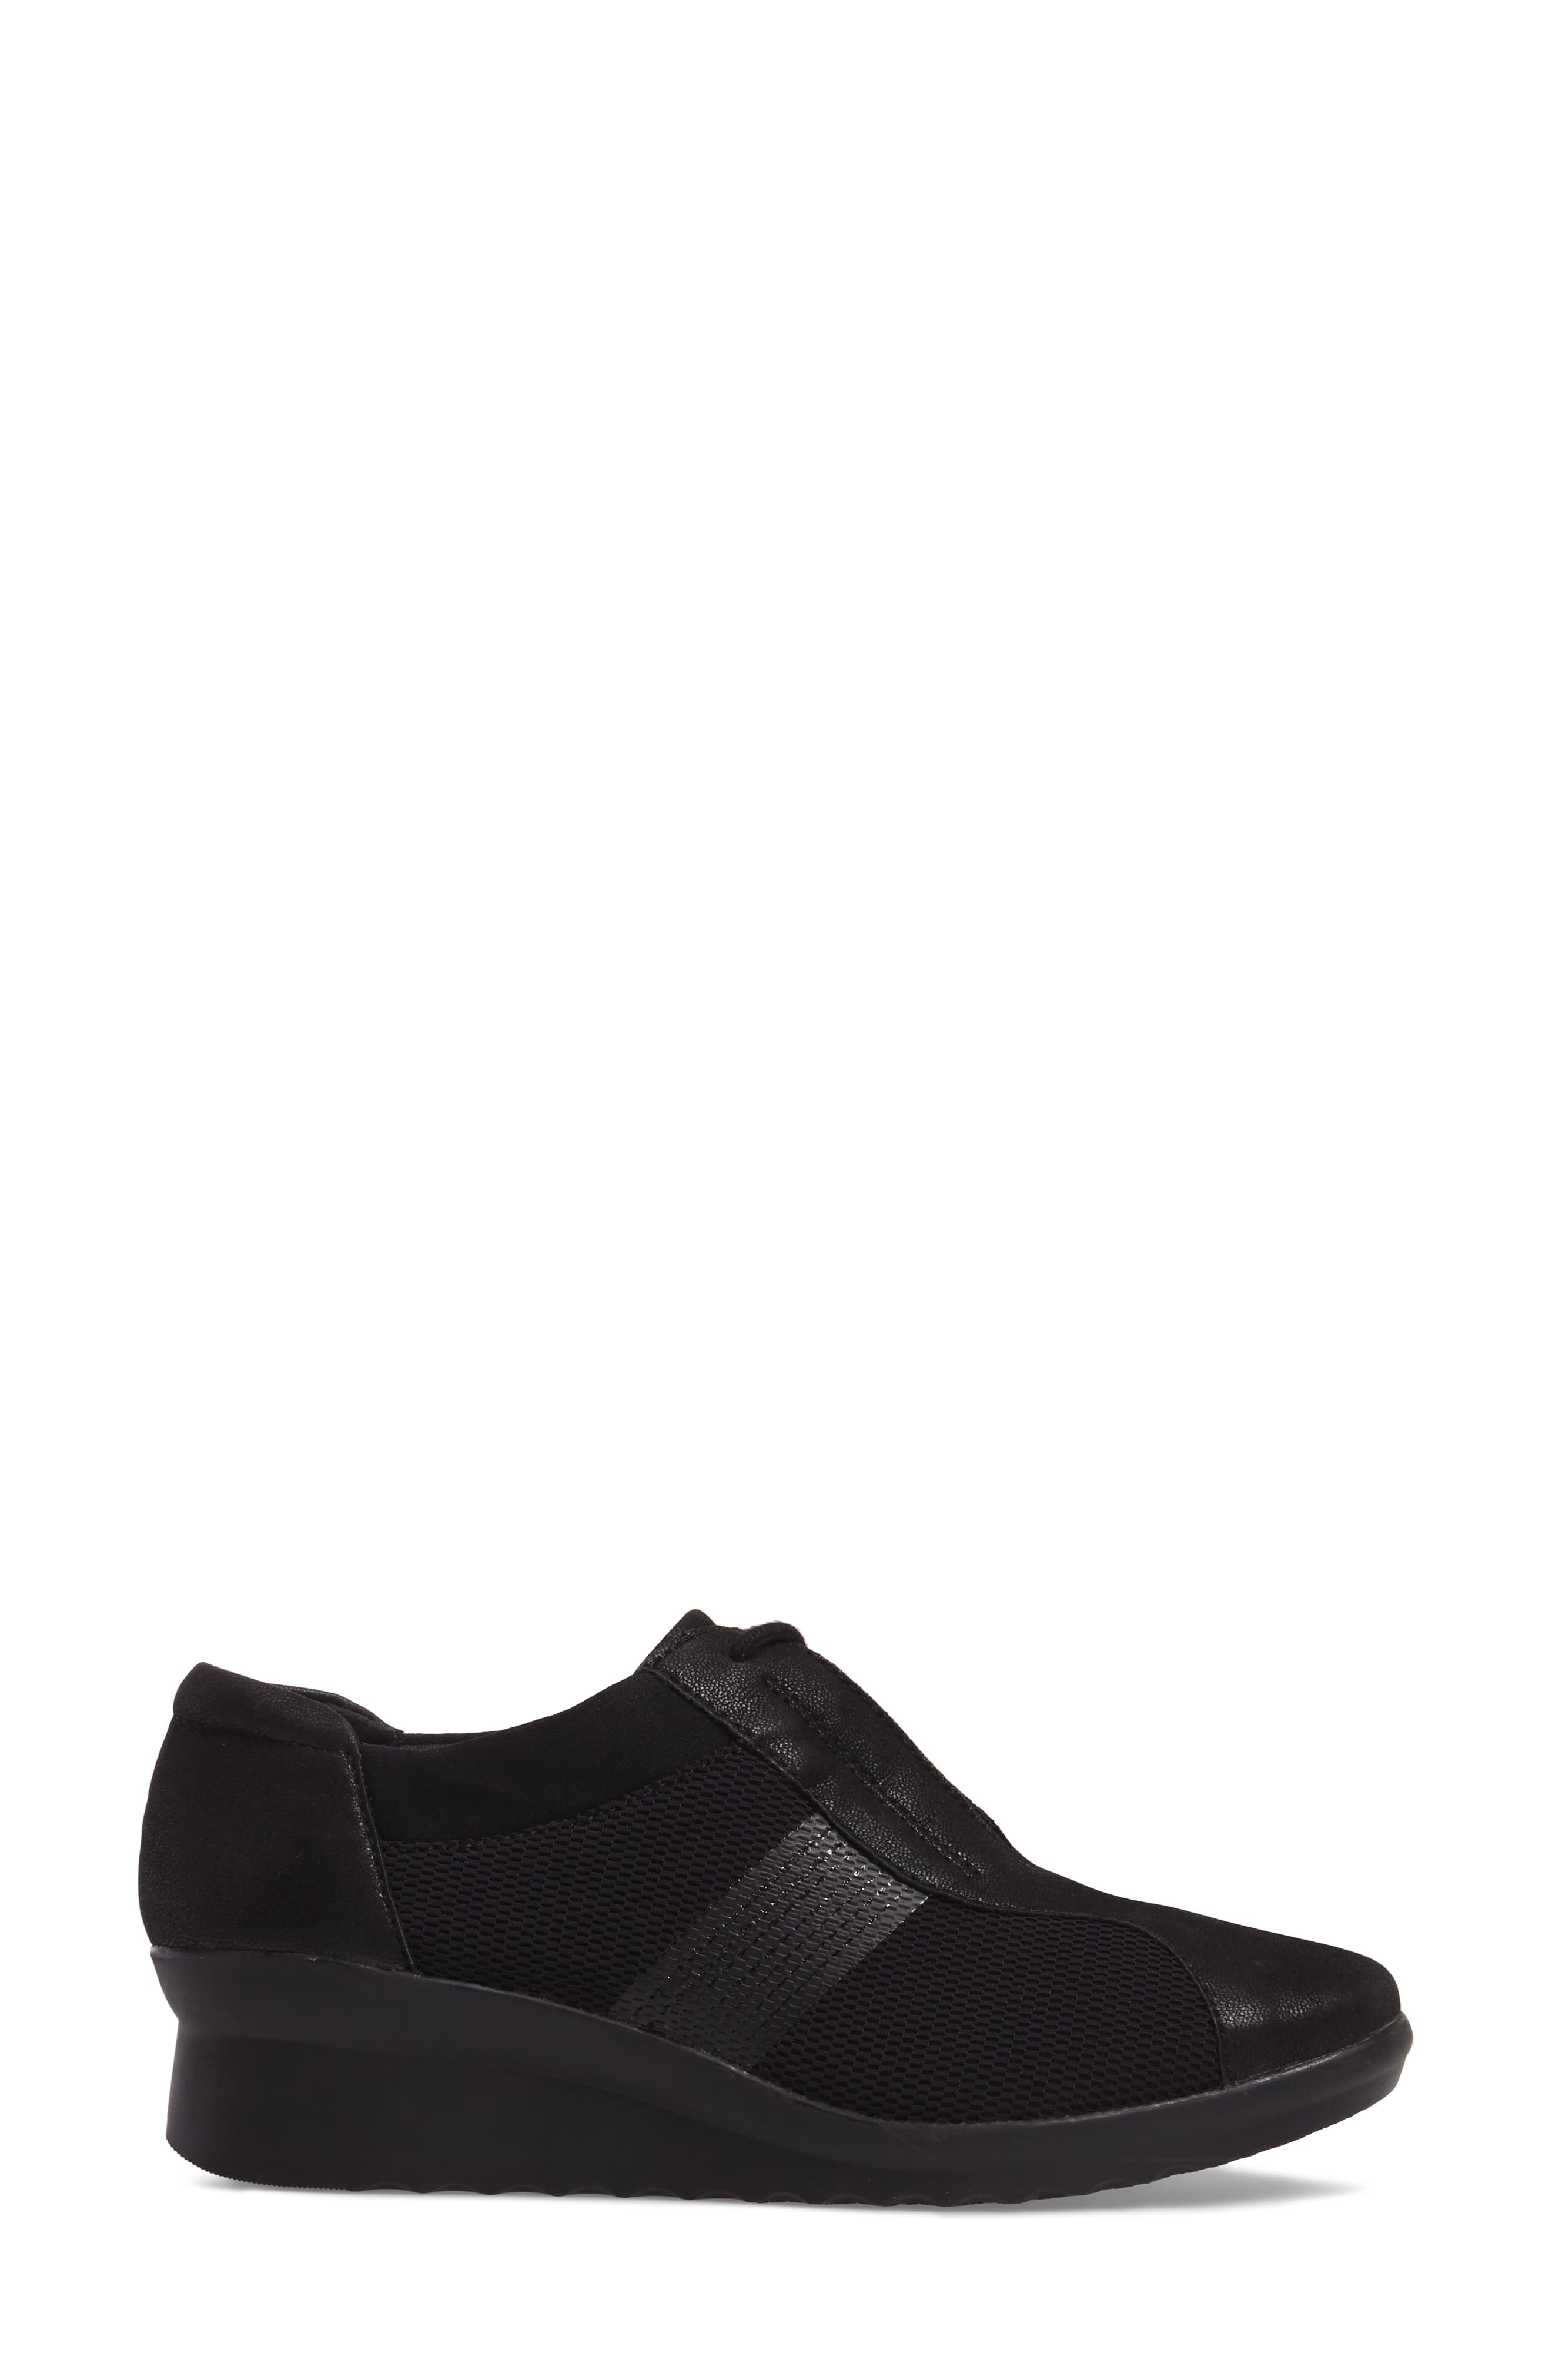 Caddell Fly Sneaker,                             Alternate thumbnail 3, color,                             BLACK FABRIC